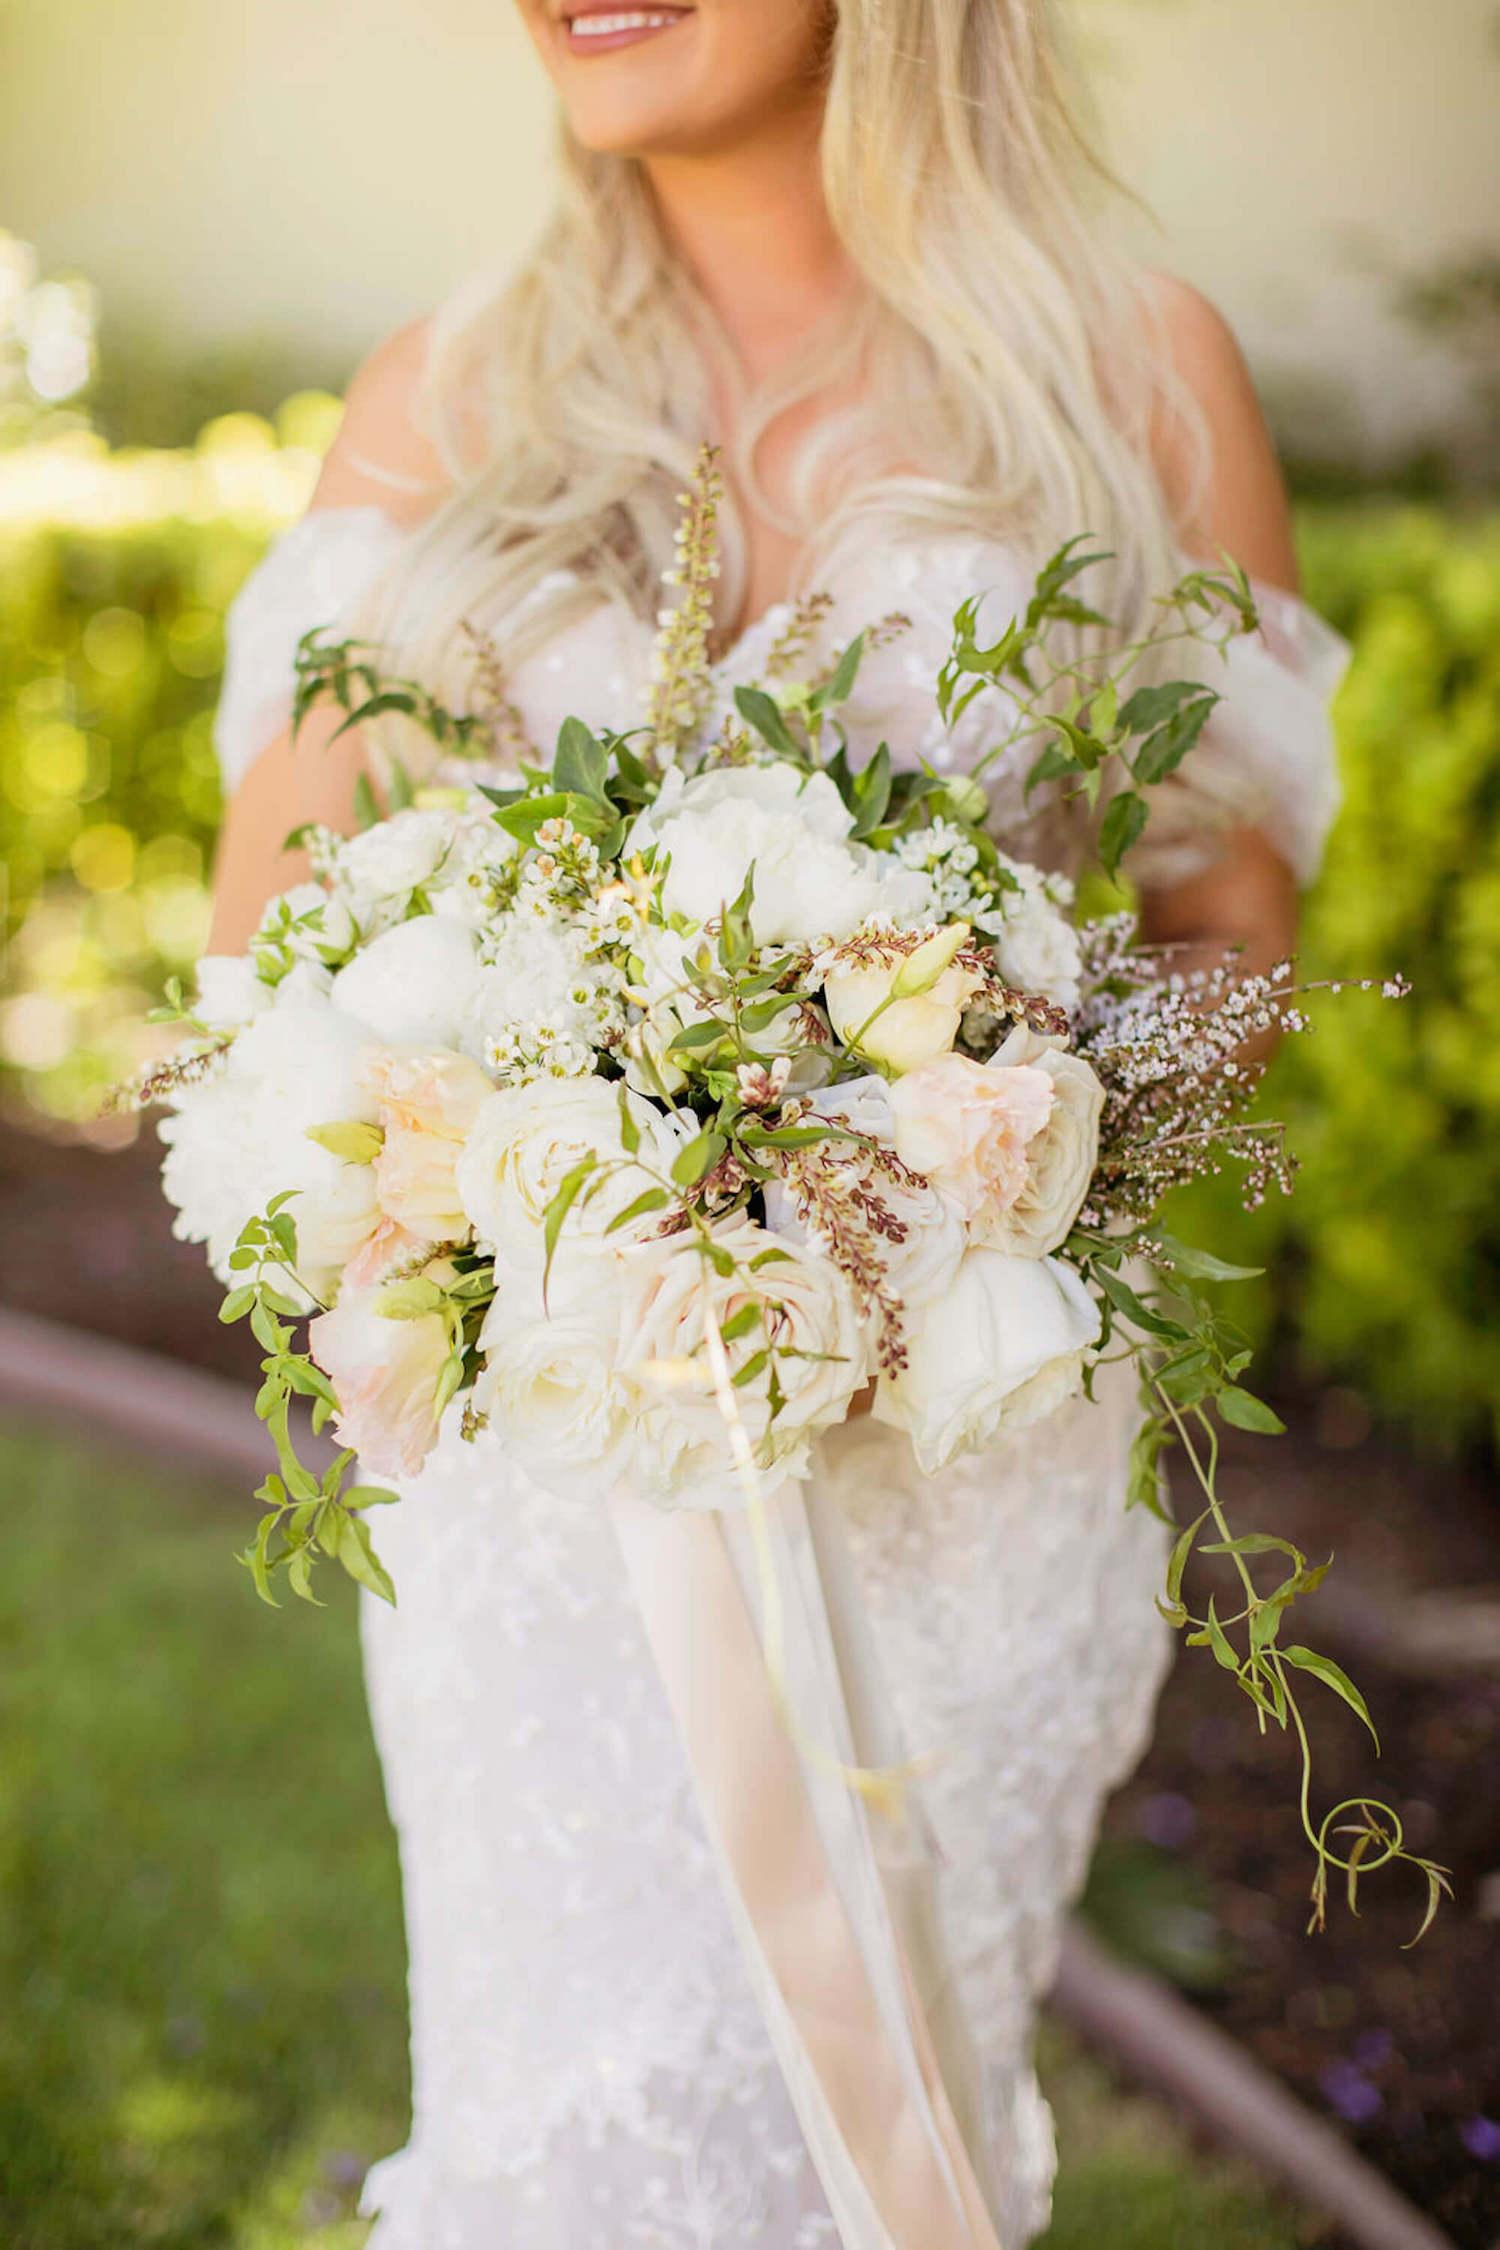 Lush wild white flowers